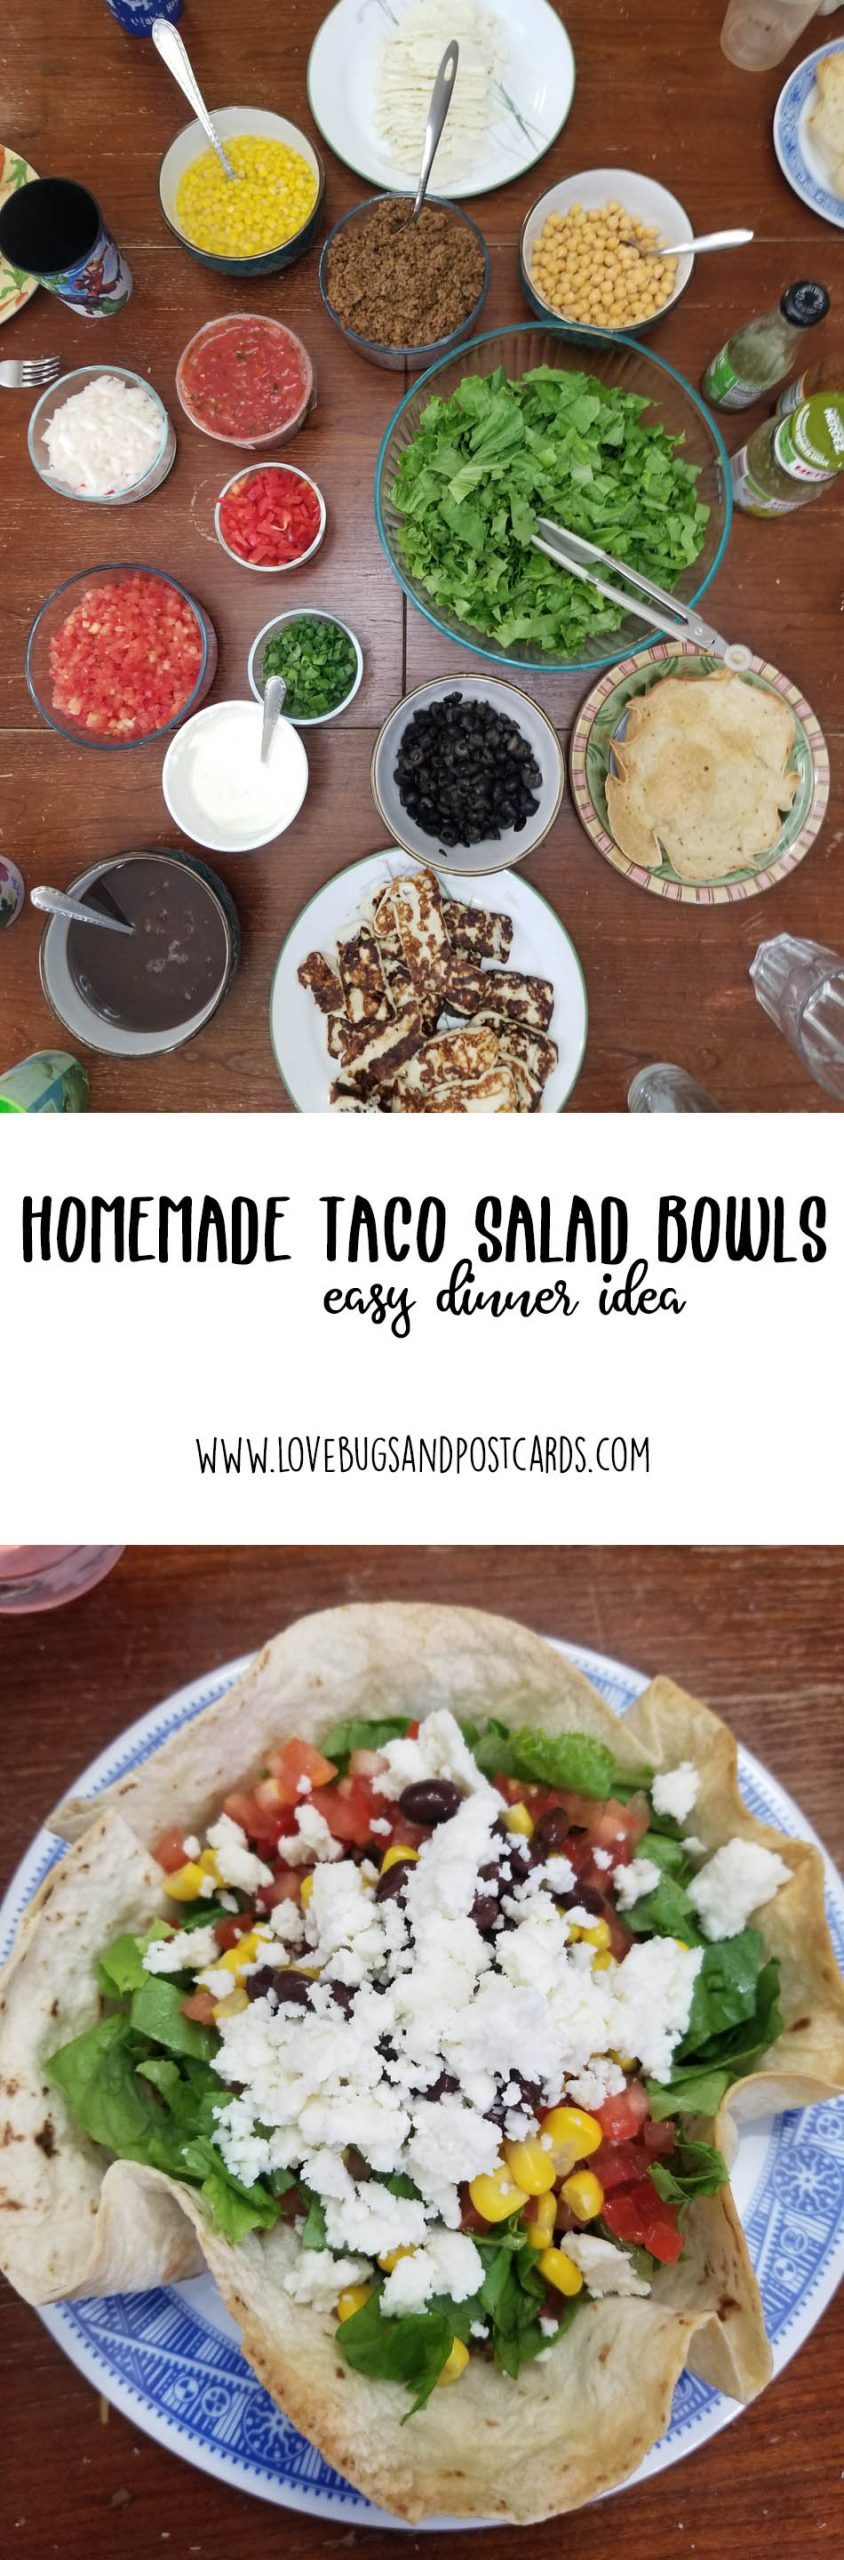 Taco Salad Recipe (with homemade tortilla bowls)